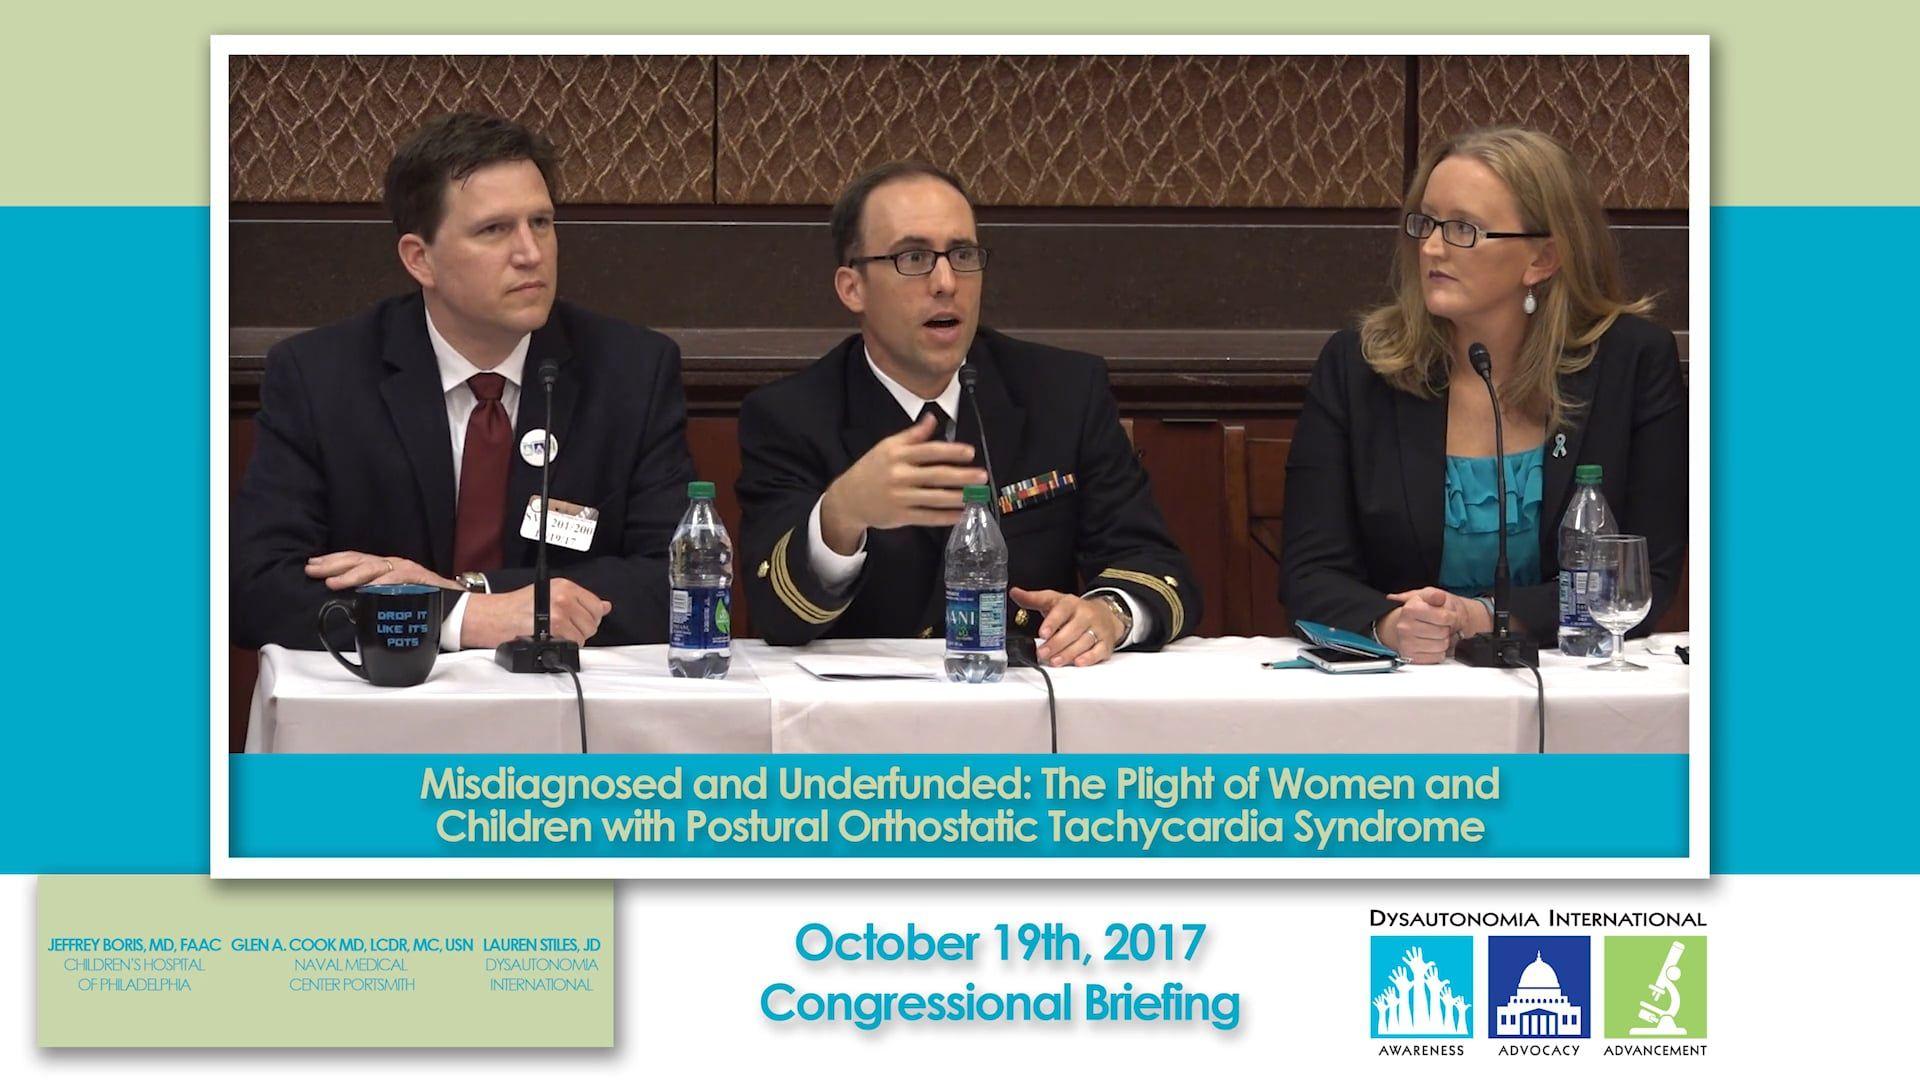 Congressional Briefing on POTS John thune, Children